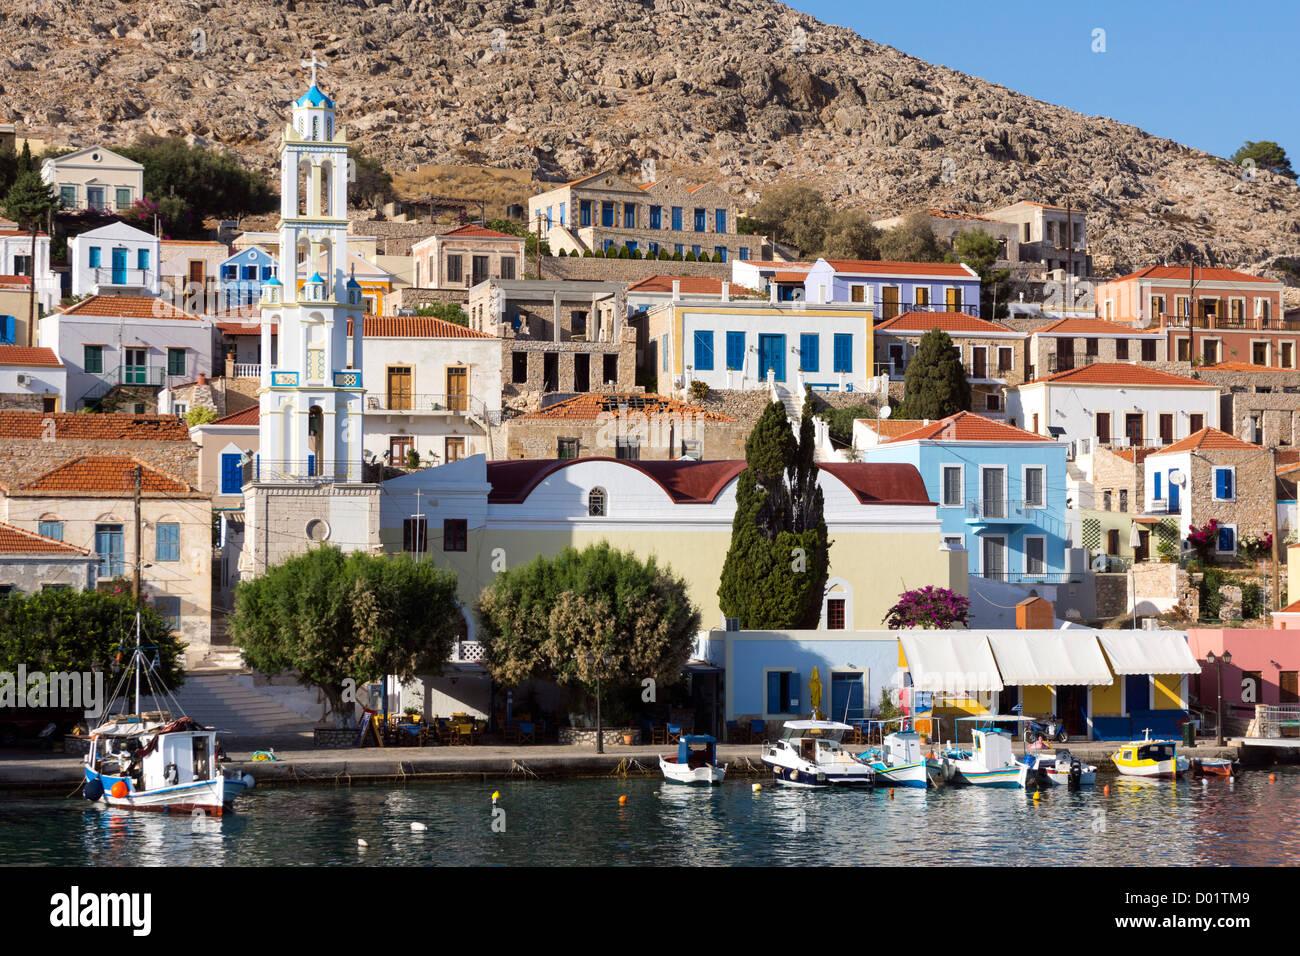 Colourful houses, Halki, Chalki, Dodekanese, Greece - Stock Image